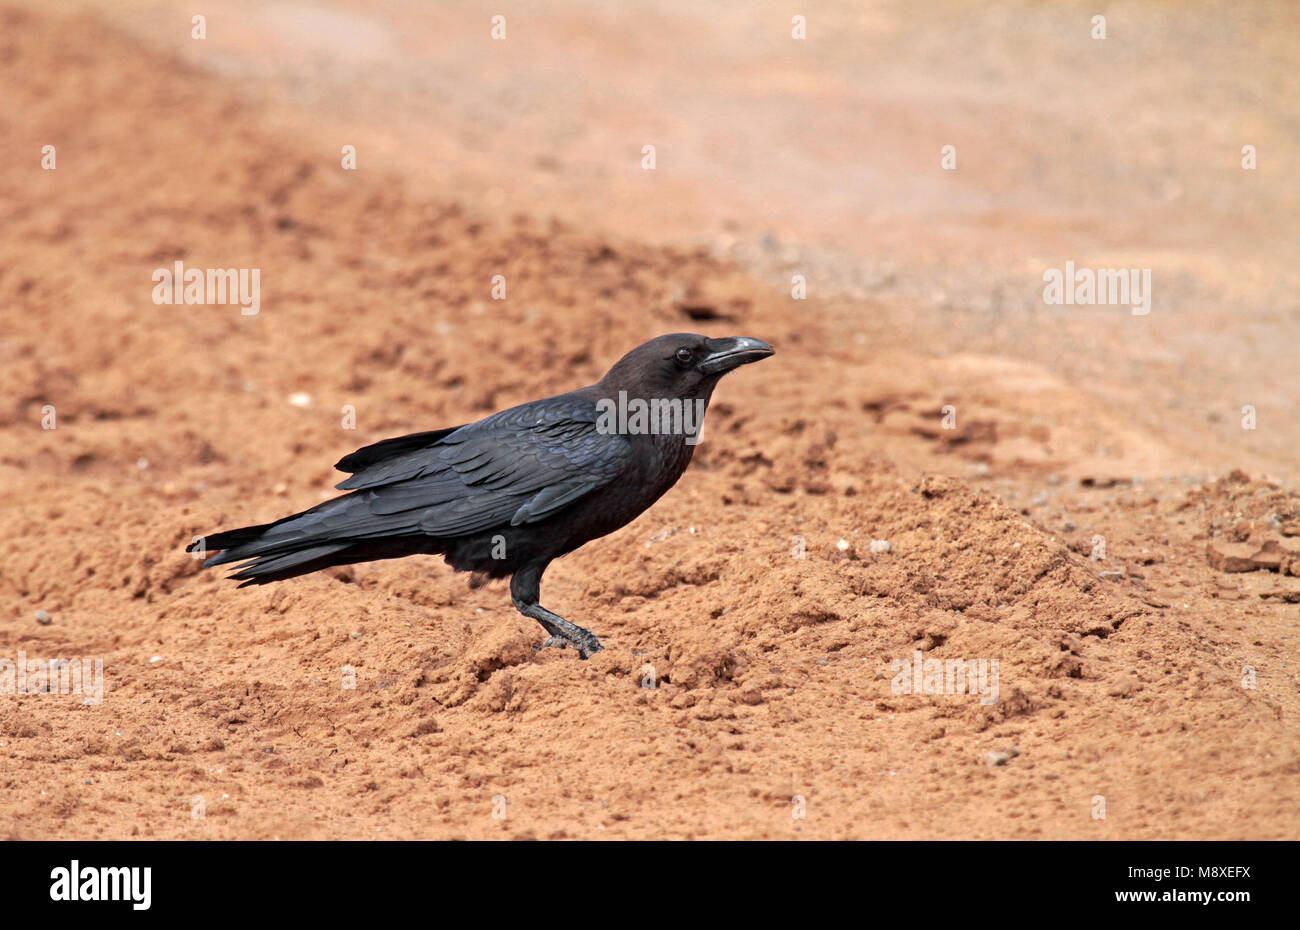 Ethiopische raaf, Somali crow - Stock Image